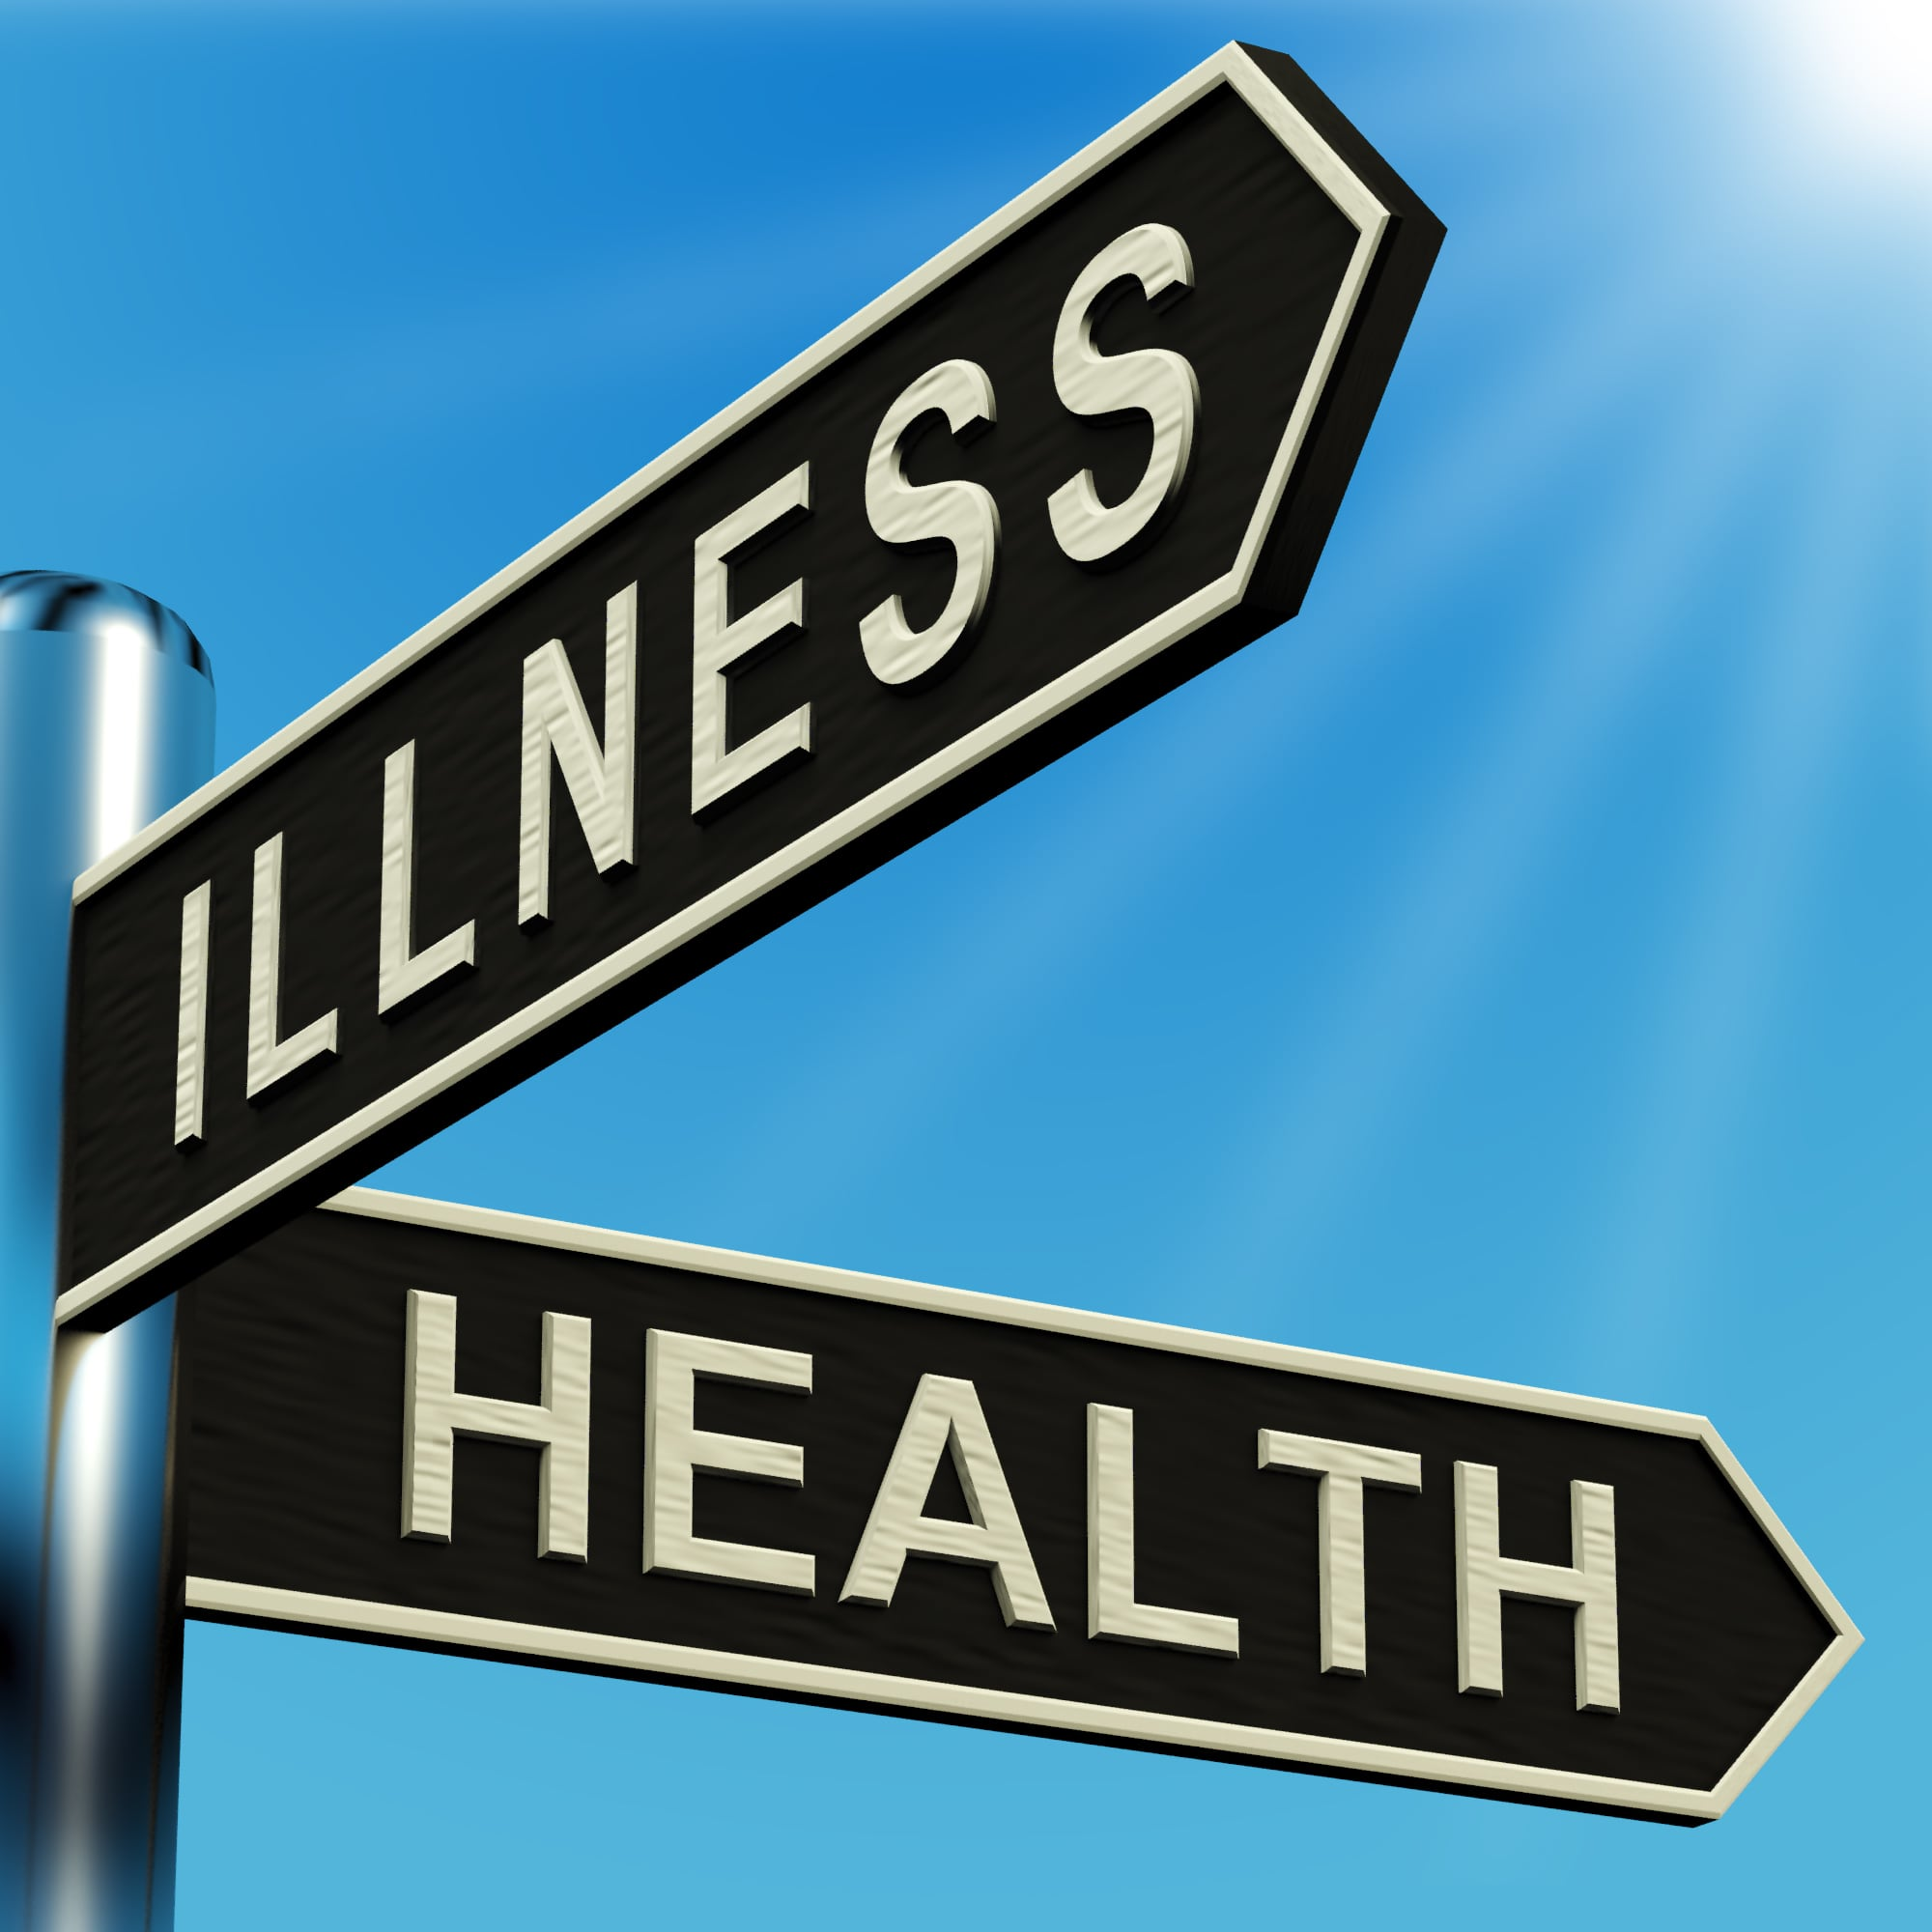 illness and health sign